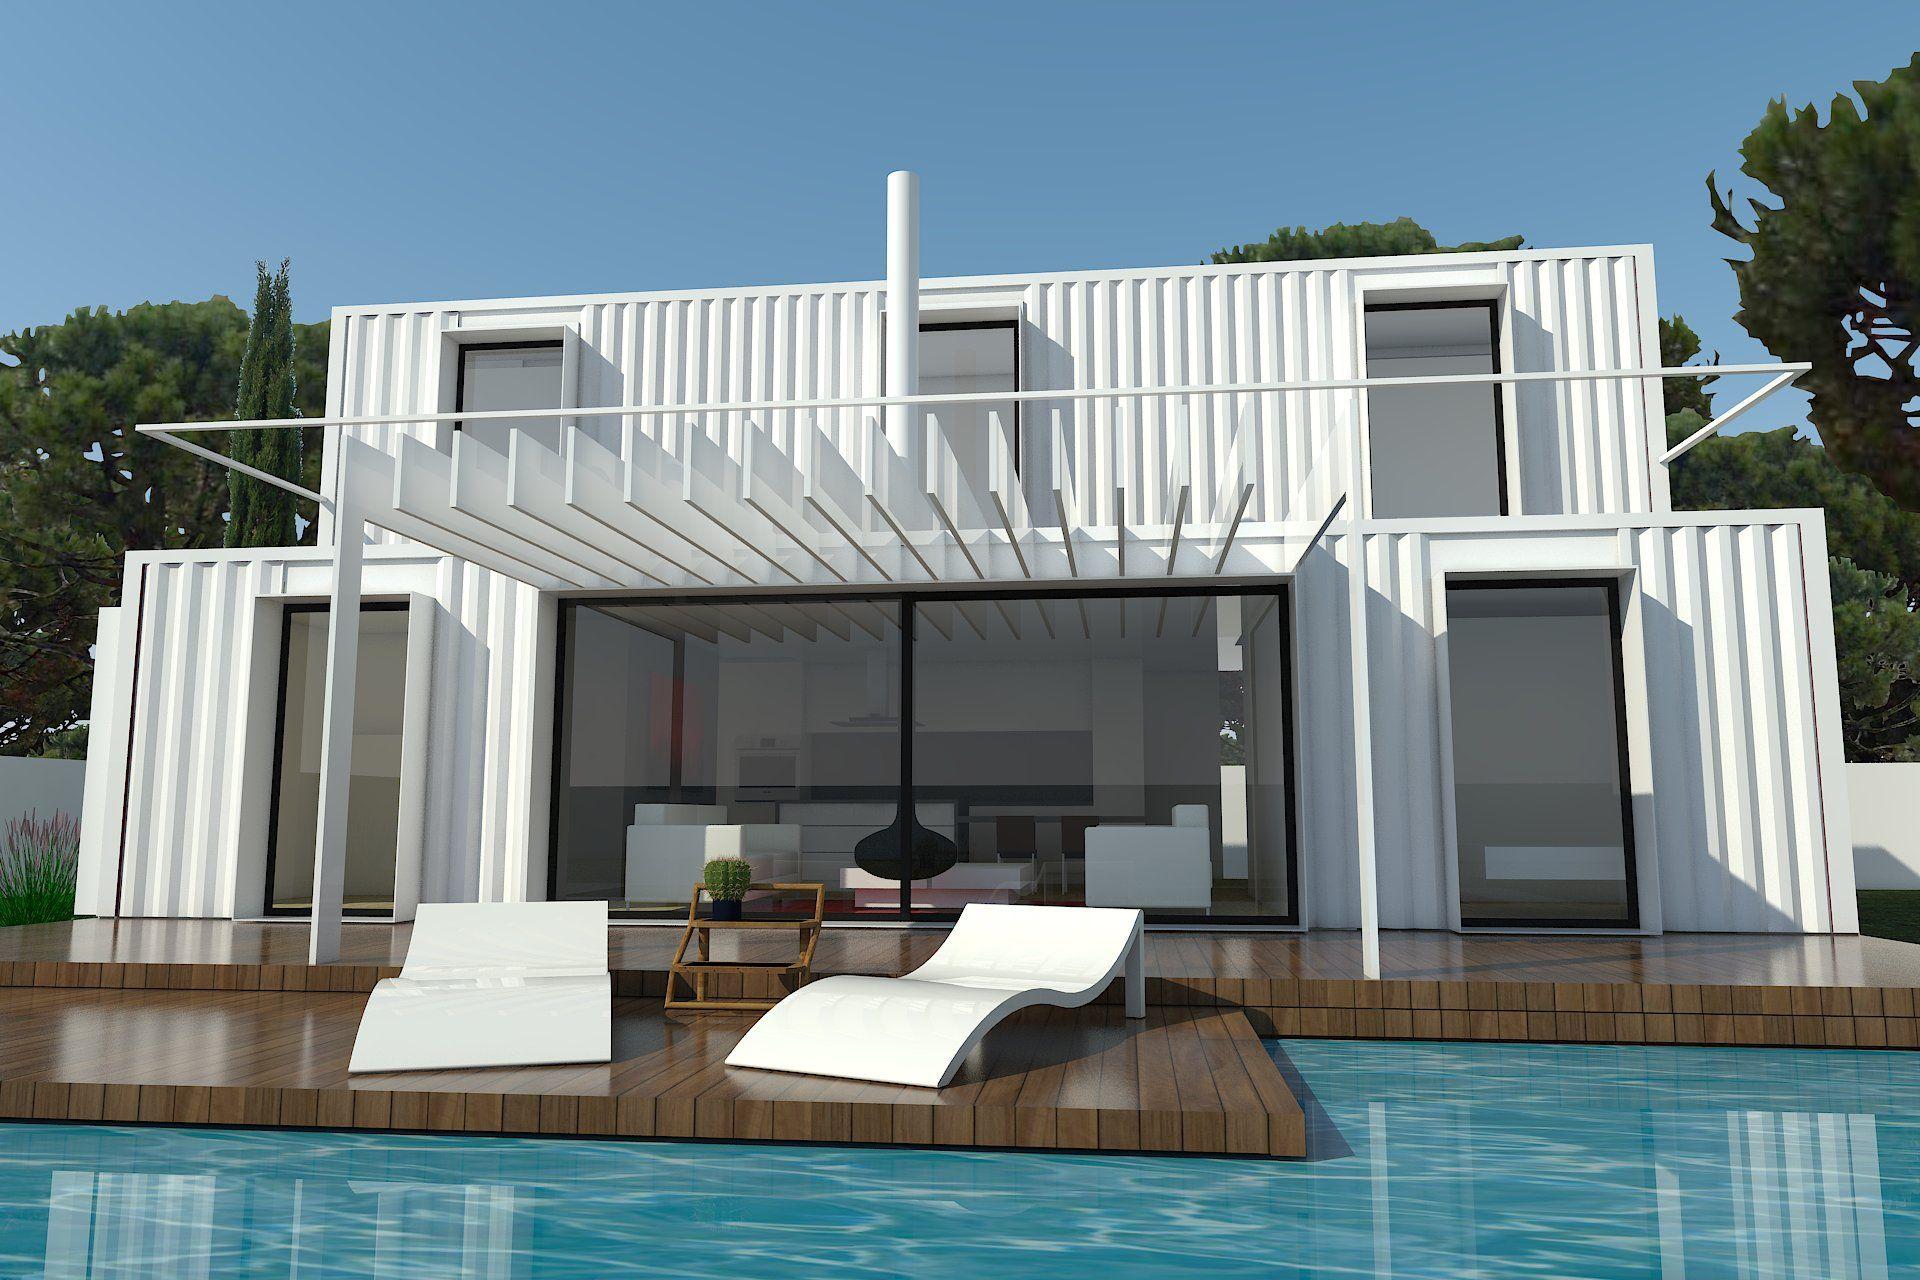 H kub casas prefabricadas en contenedores mar timos mi - Contenedor maritimo casa ...